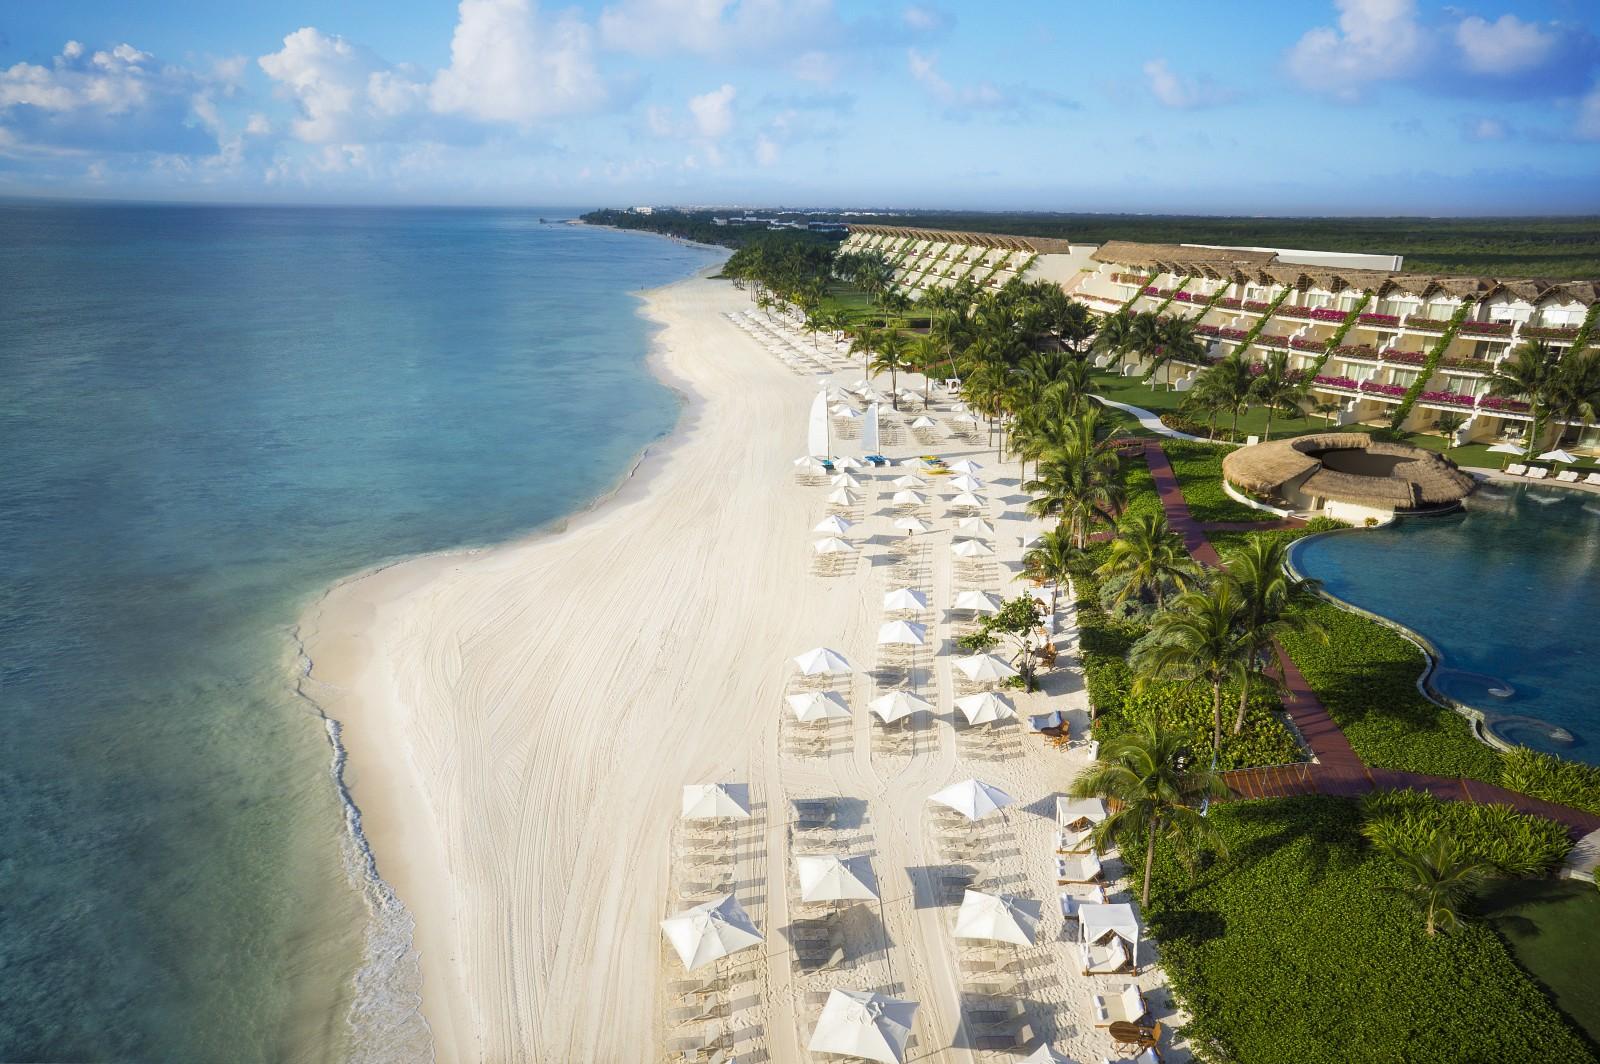 Travel Agency All-Inclusive Resort Grand Velas Riviera Maya 004